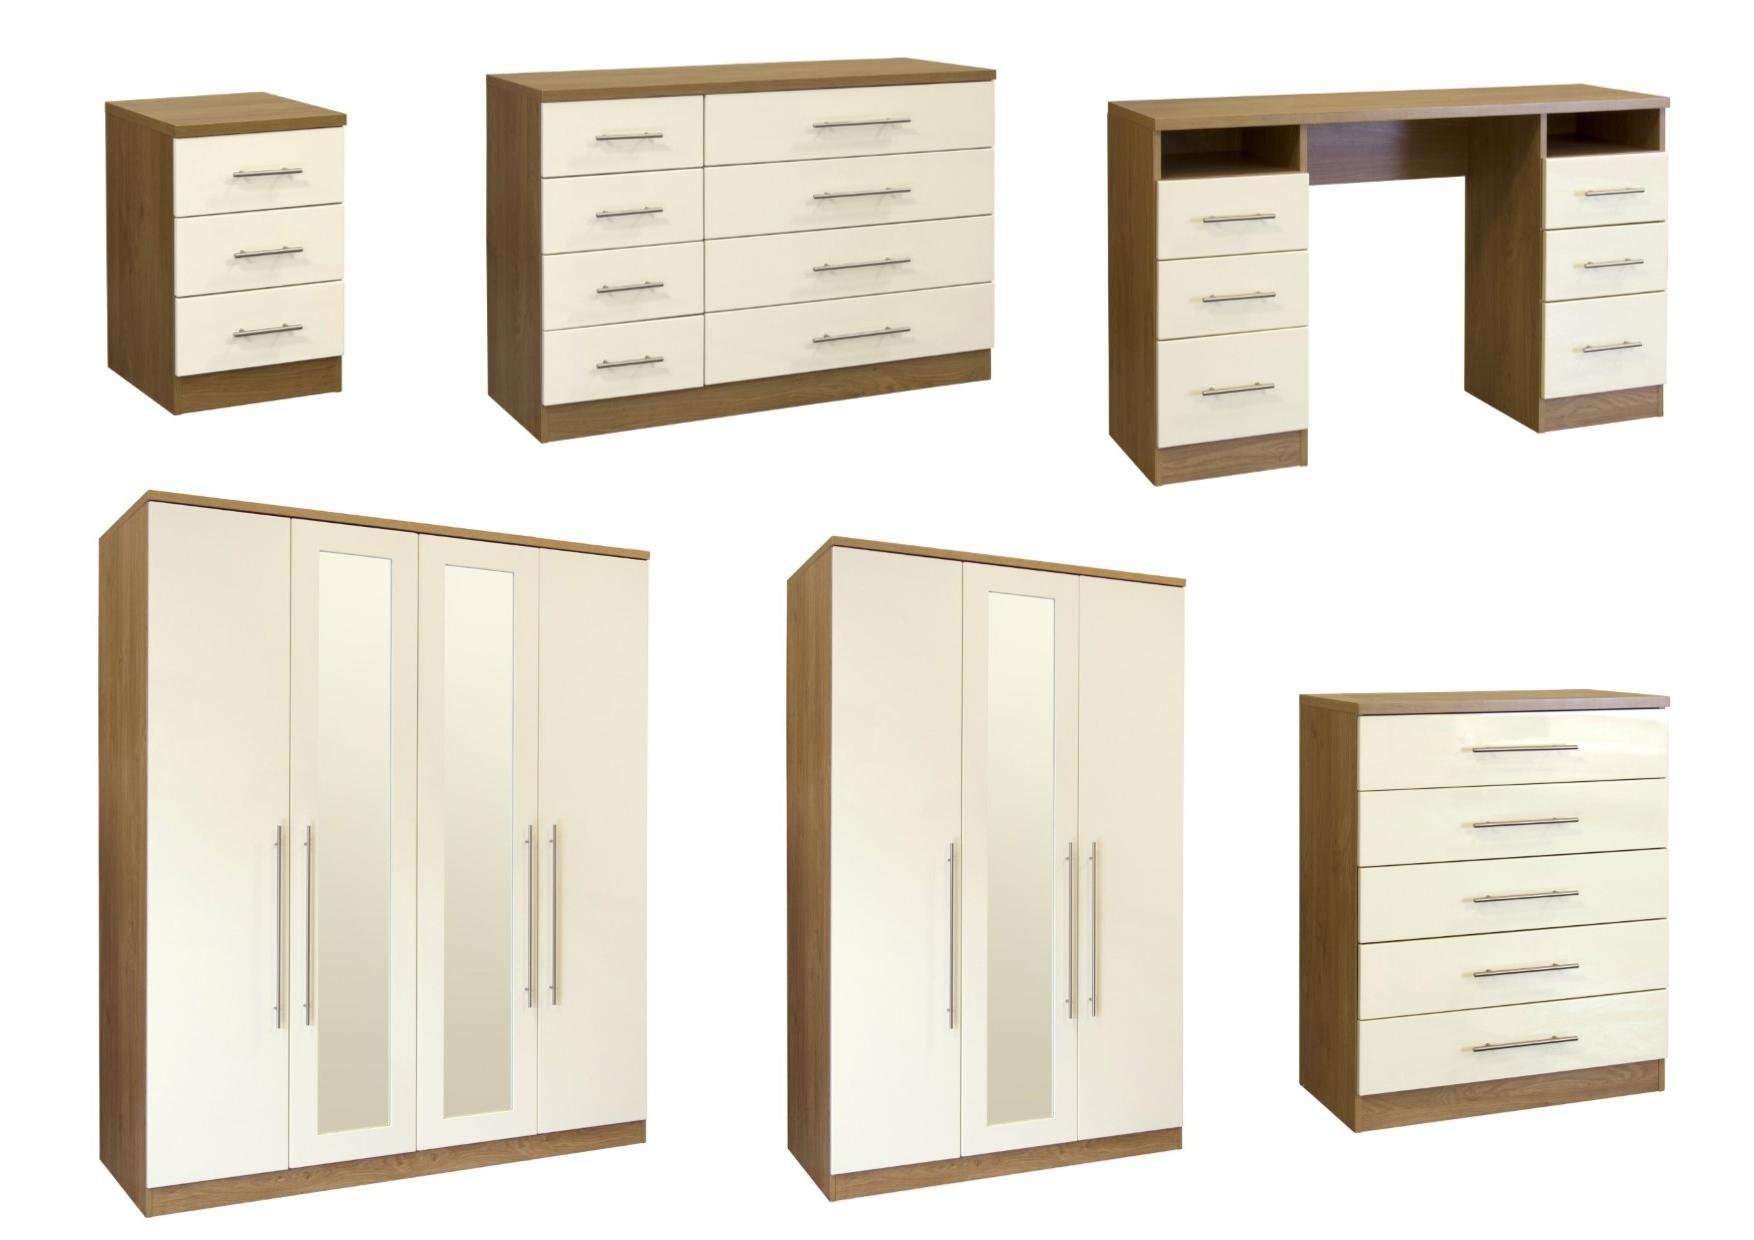 Well Liked Keswick High Gloss Cream & Oak Bedroom Furniture – Wardrobe Regarding Cream Gloss Wardrobes (View 15 of 15)